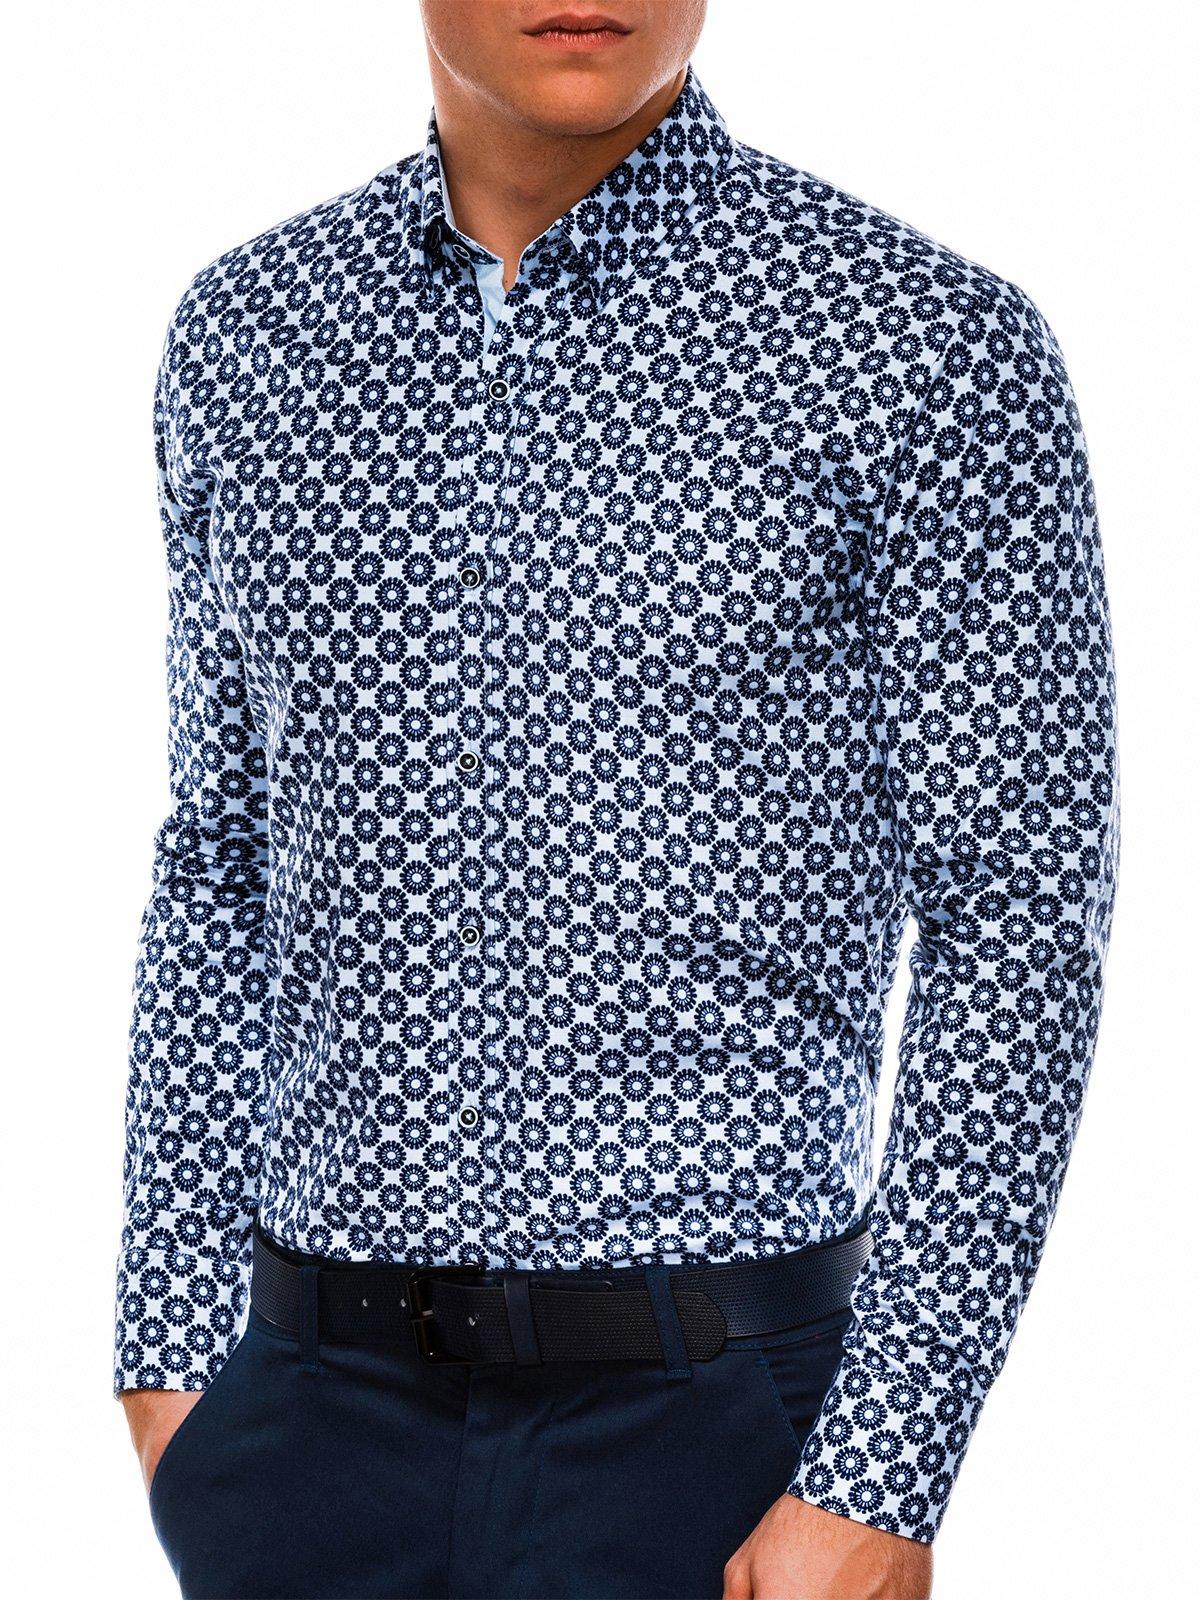 Купить со скидкой Сорочка чоловіча елегантна з довгим рукавом K499 – блакитна/темно-синя